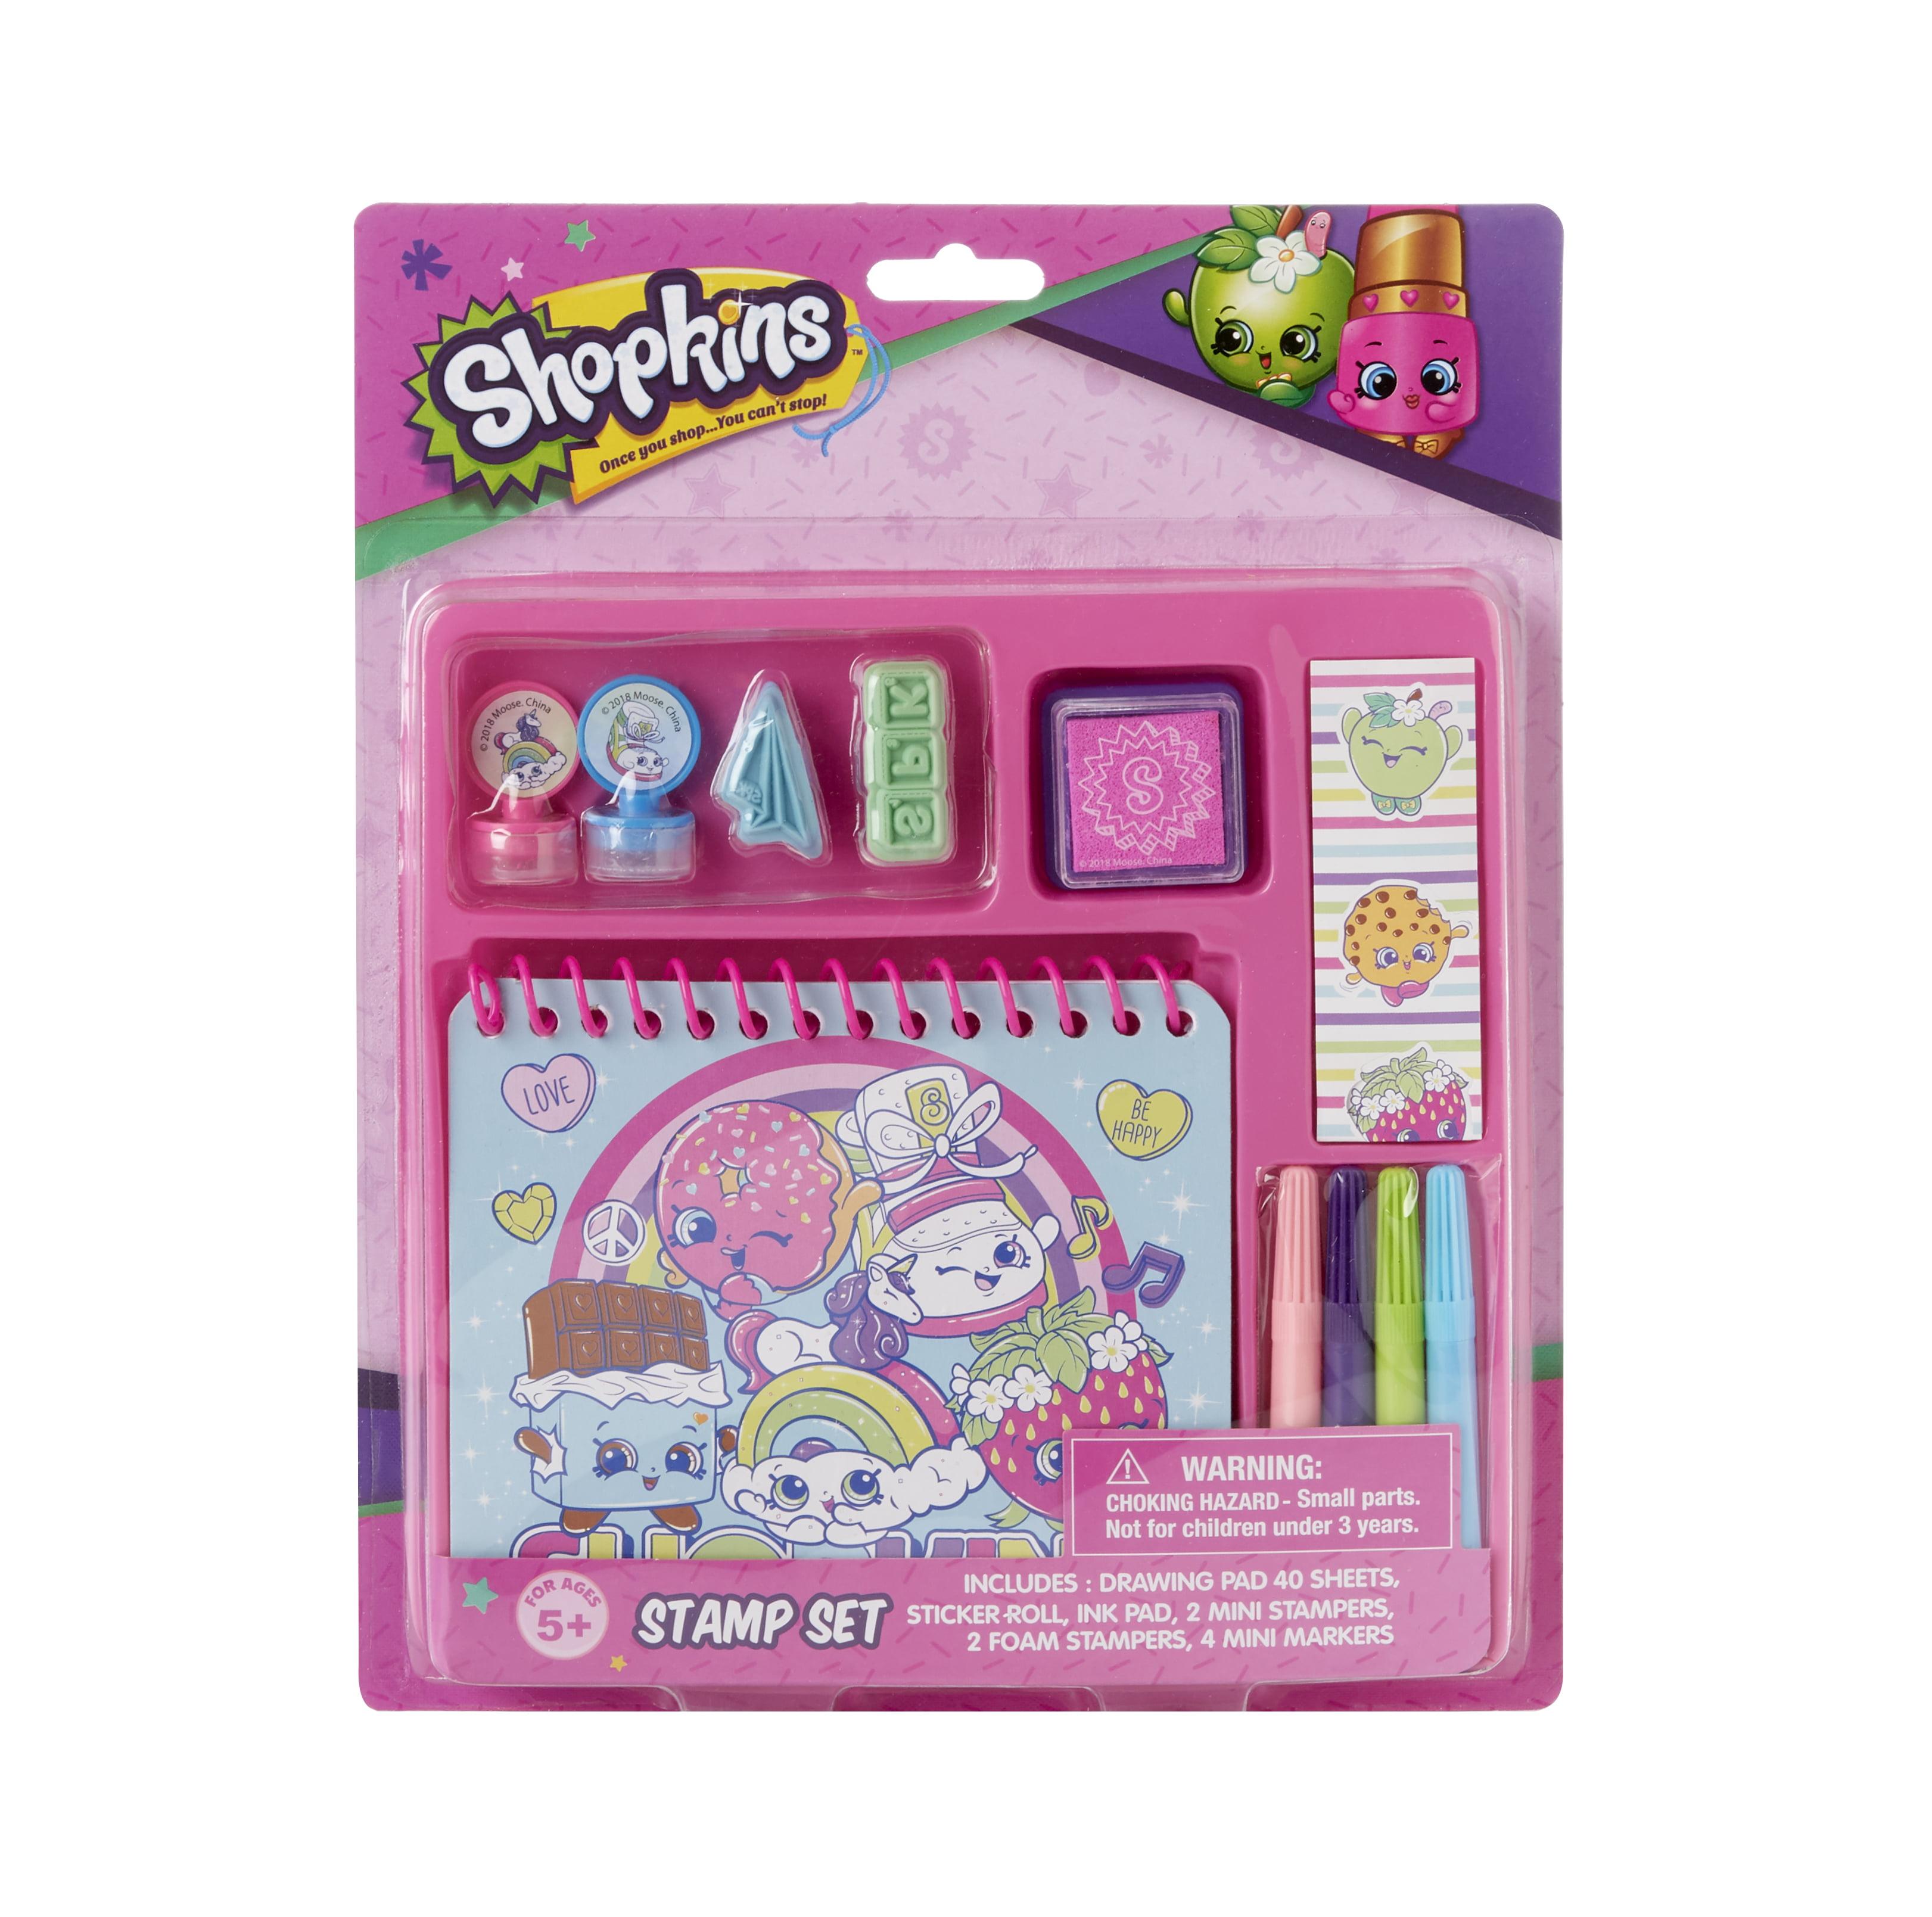 Shopkins Stamp Kit